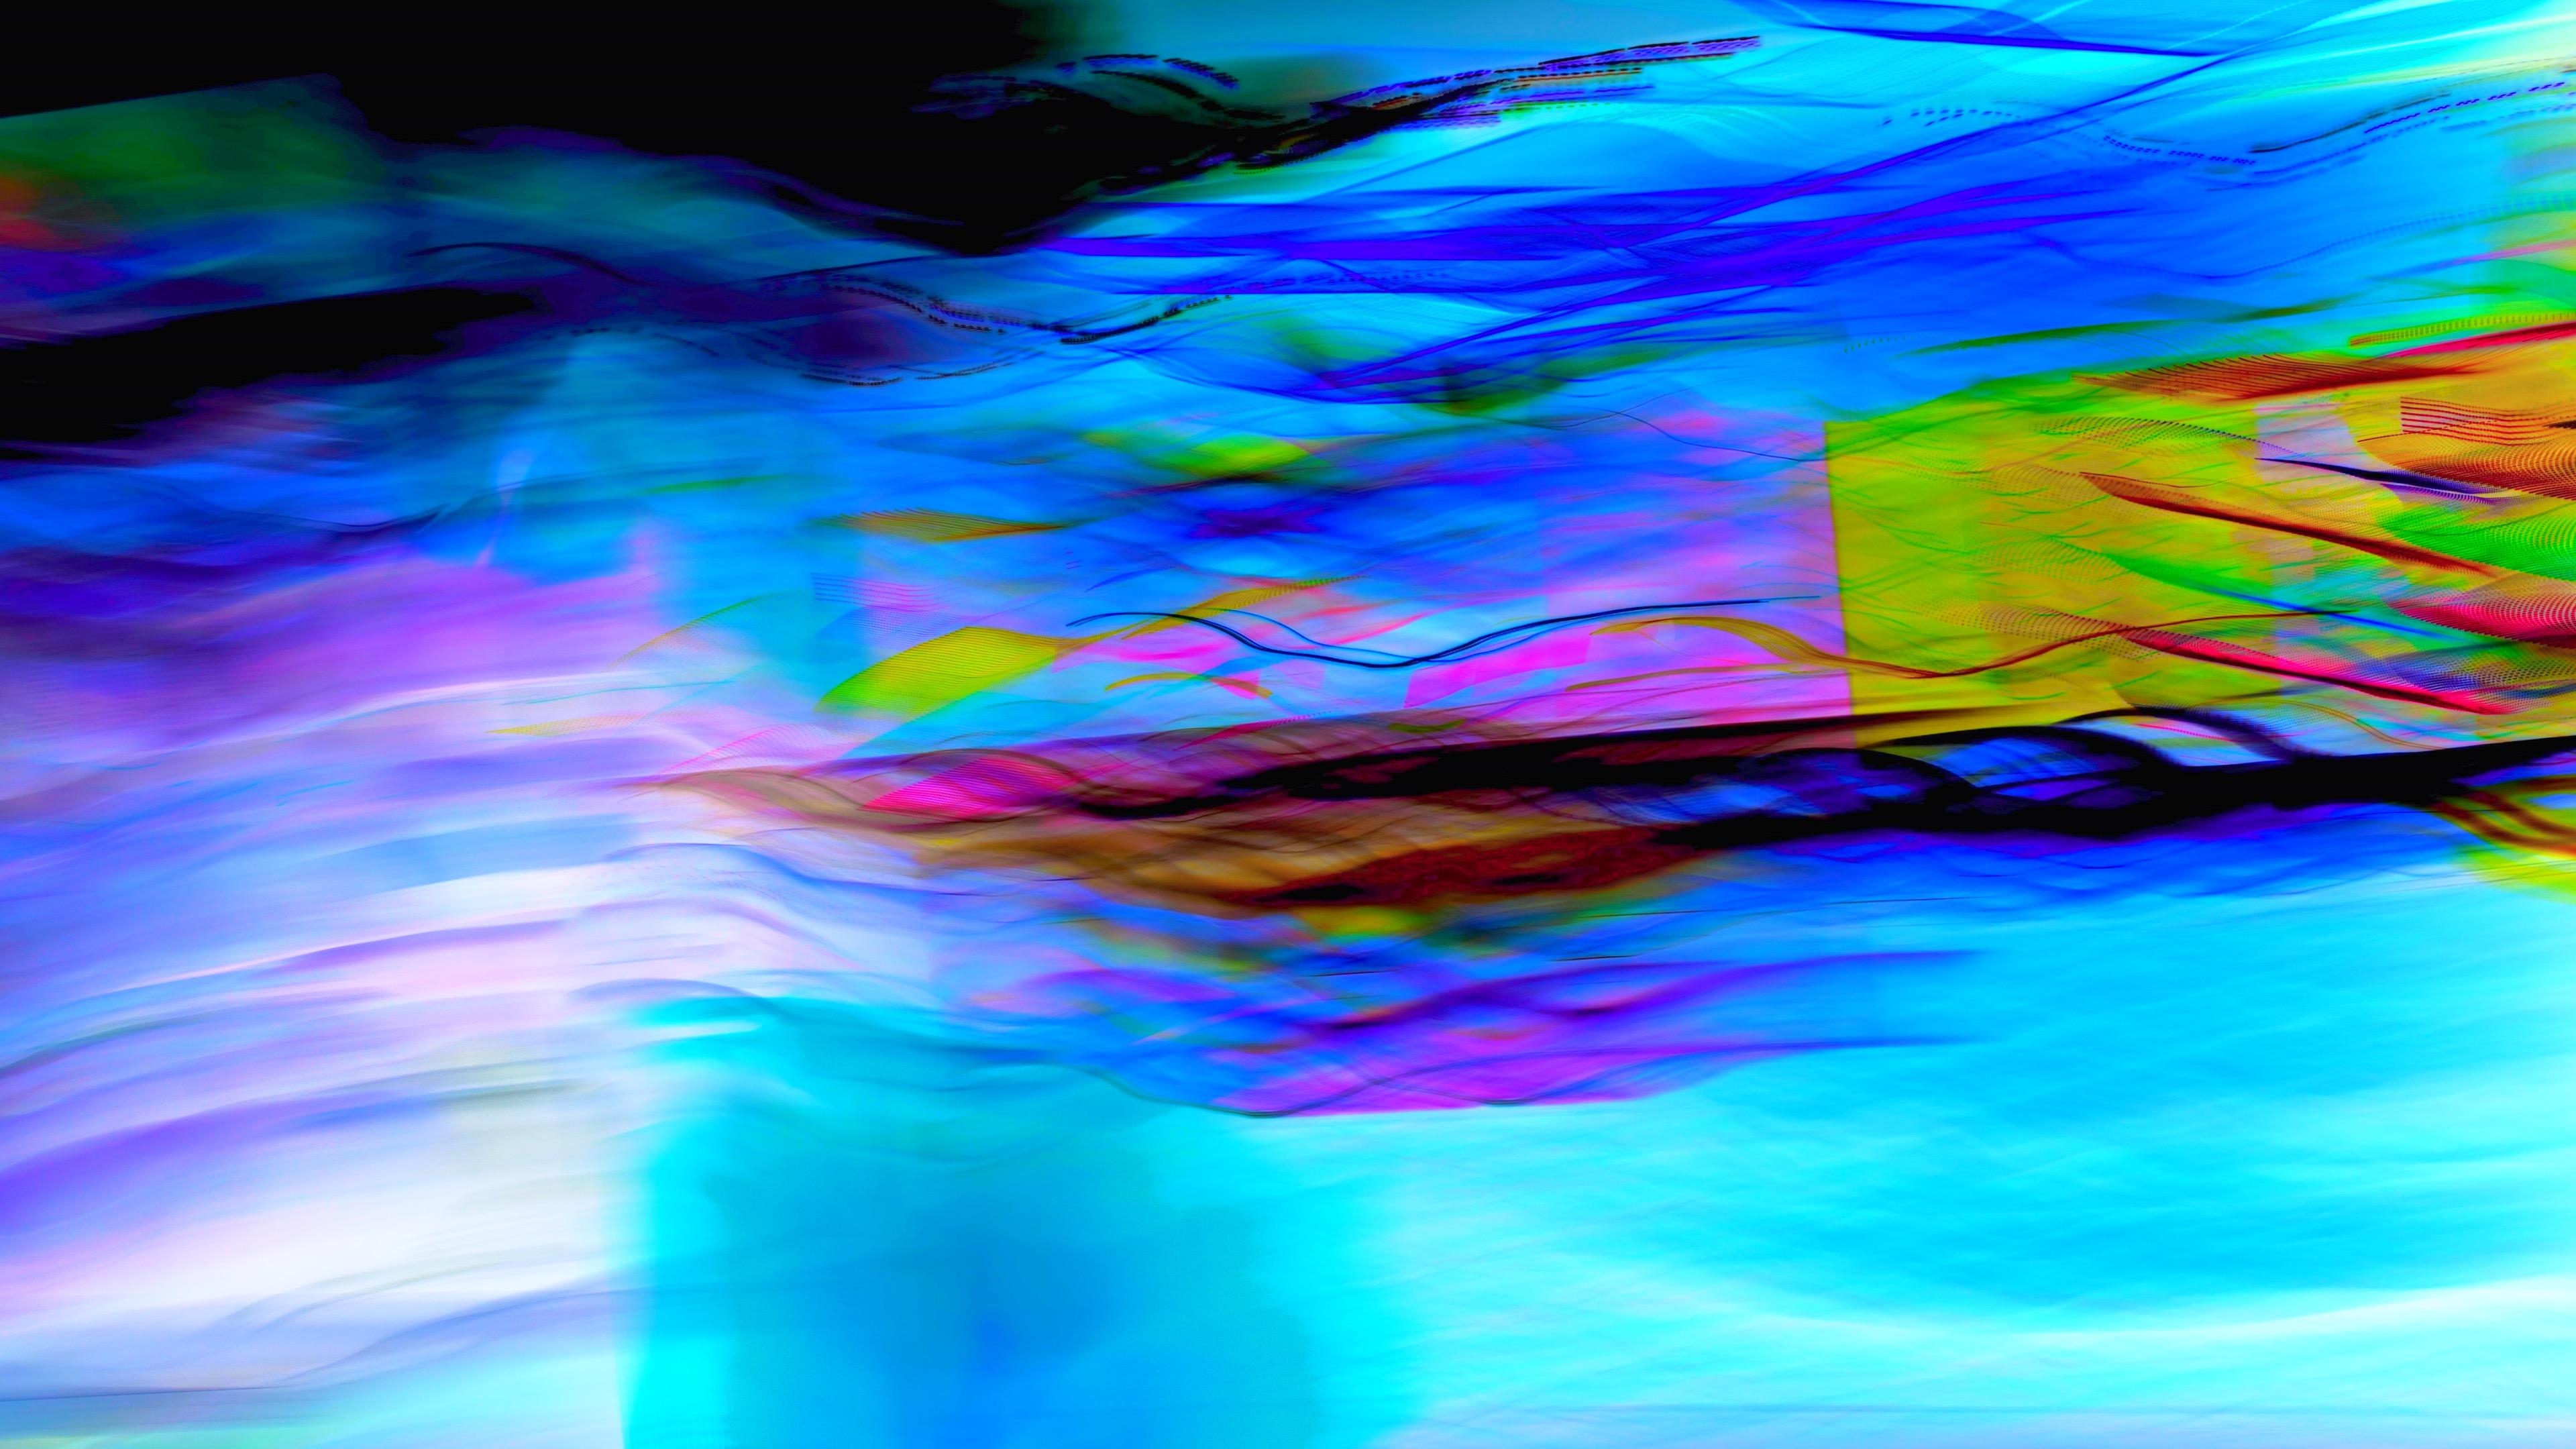 Arcade Abstract Image 2